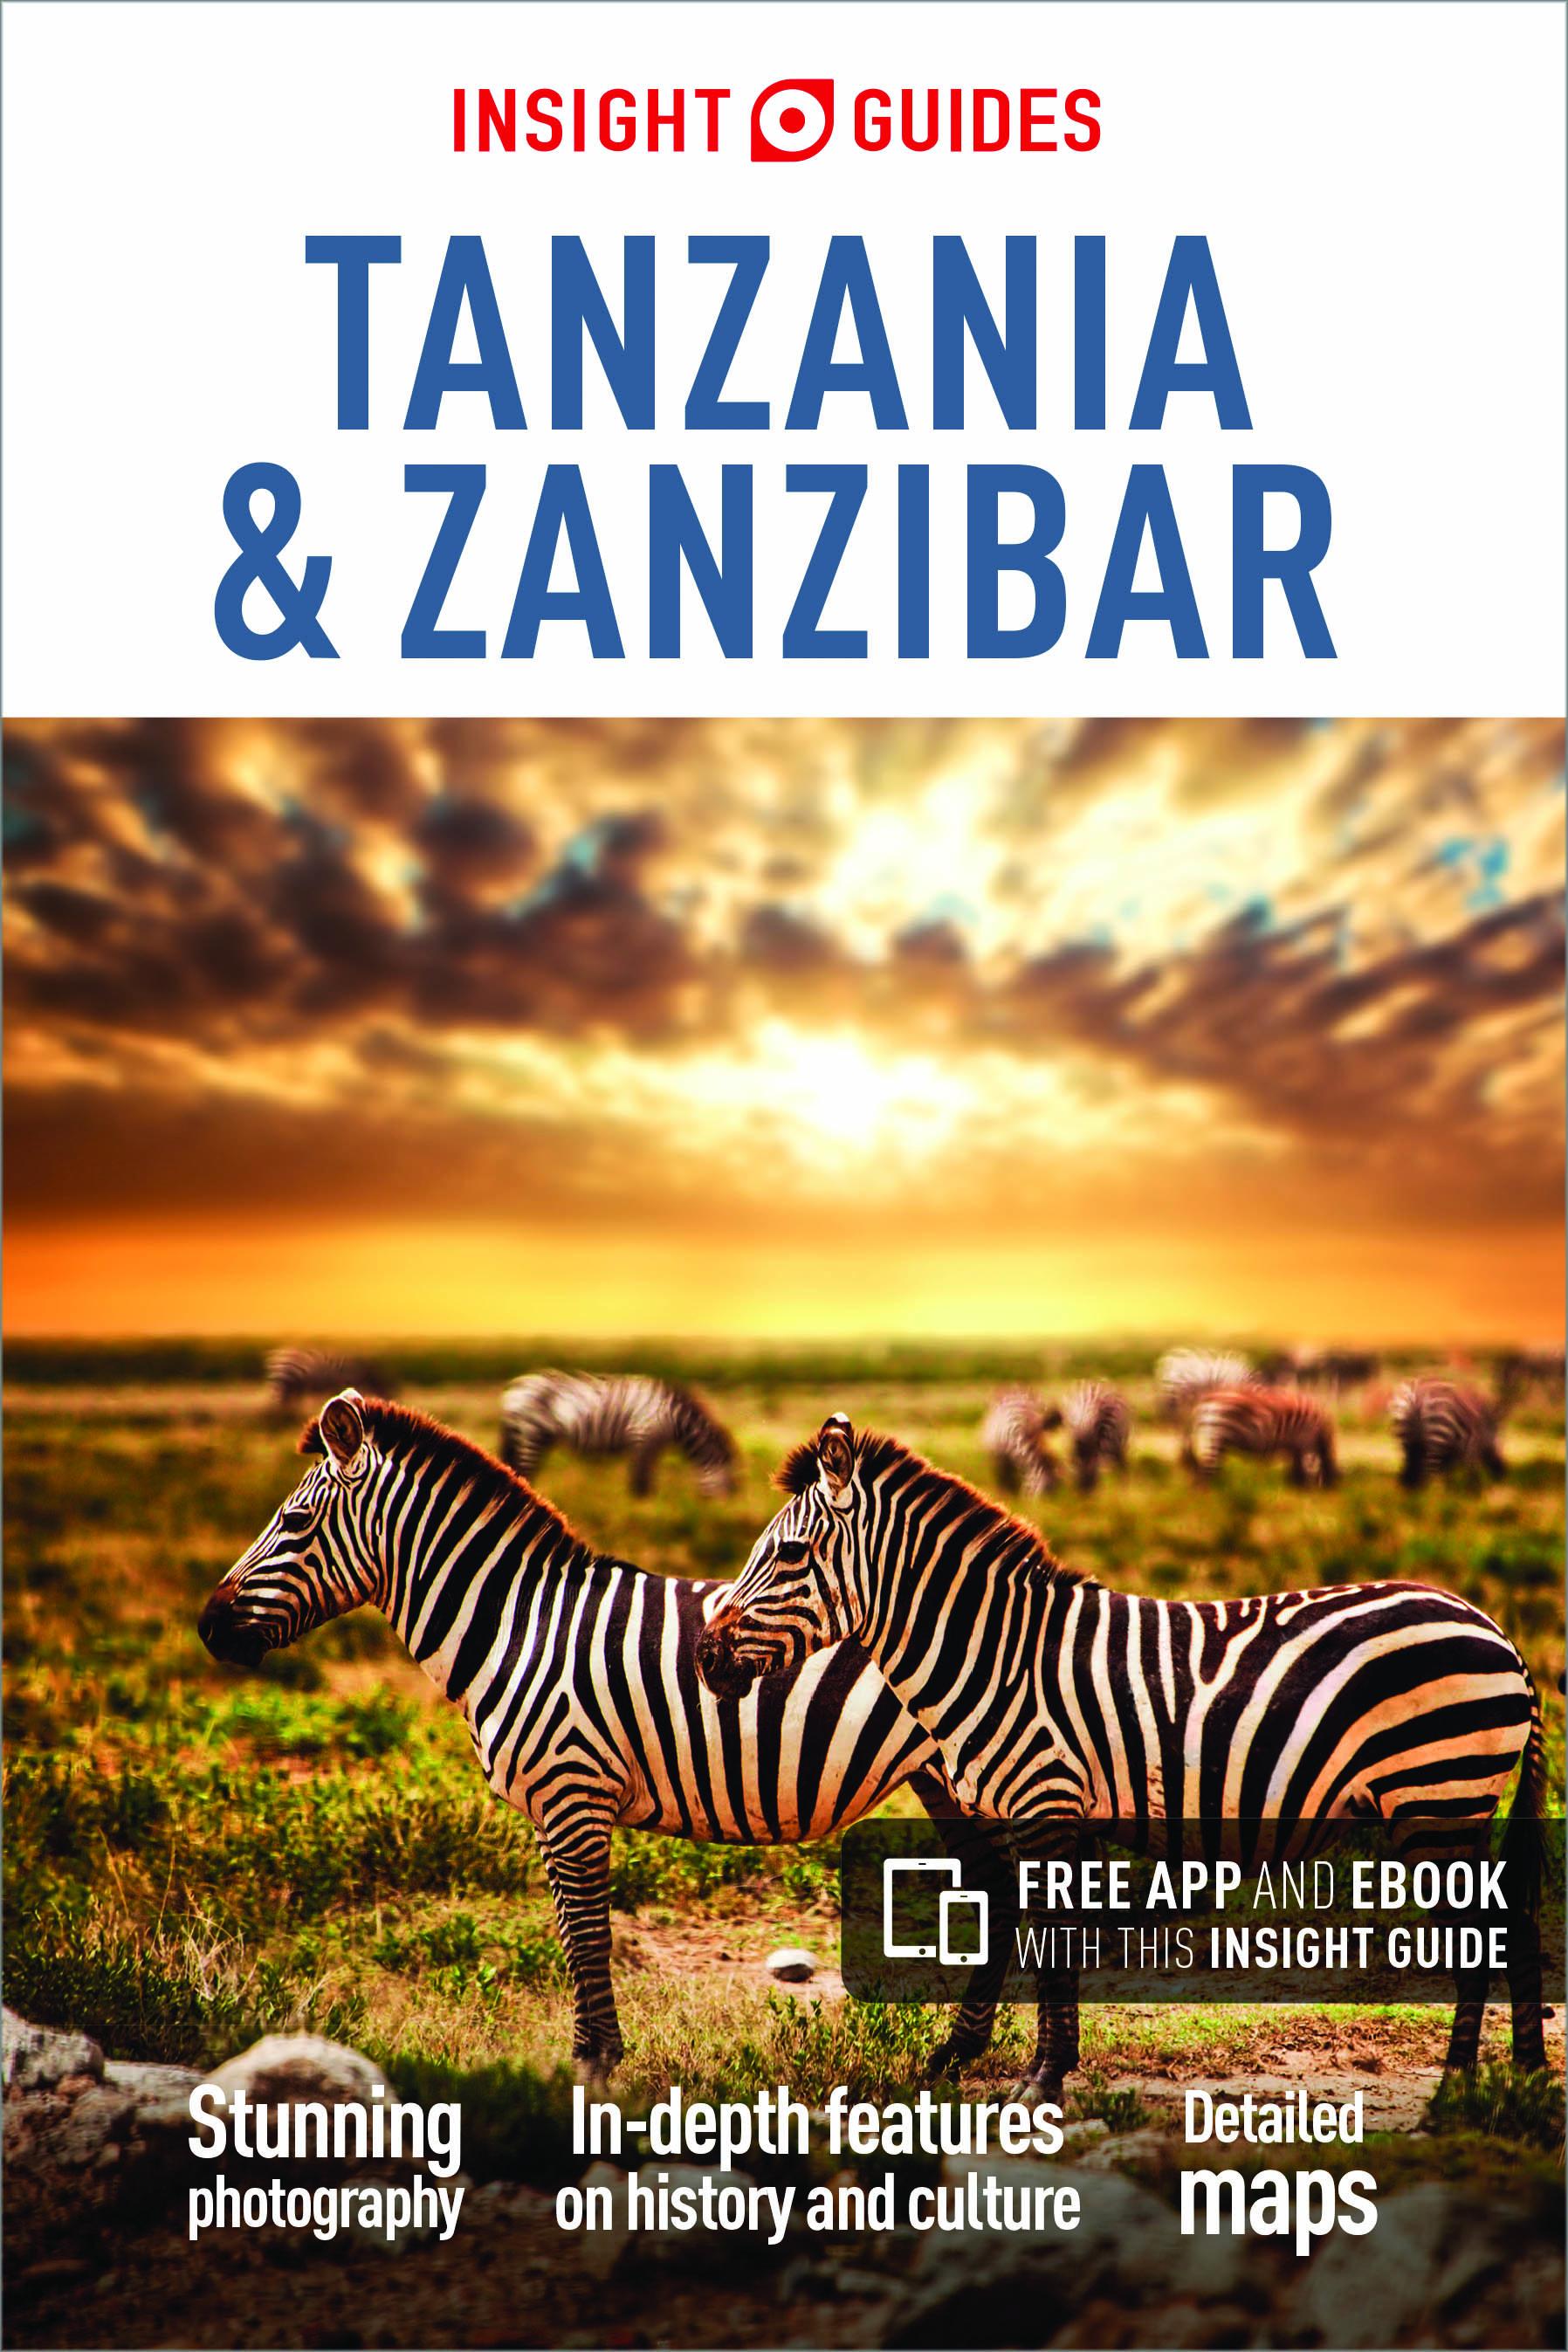 Tanzania & Zanzibar (Travel Guide with Free eBook)